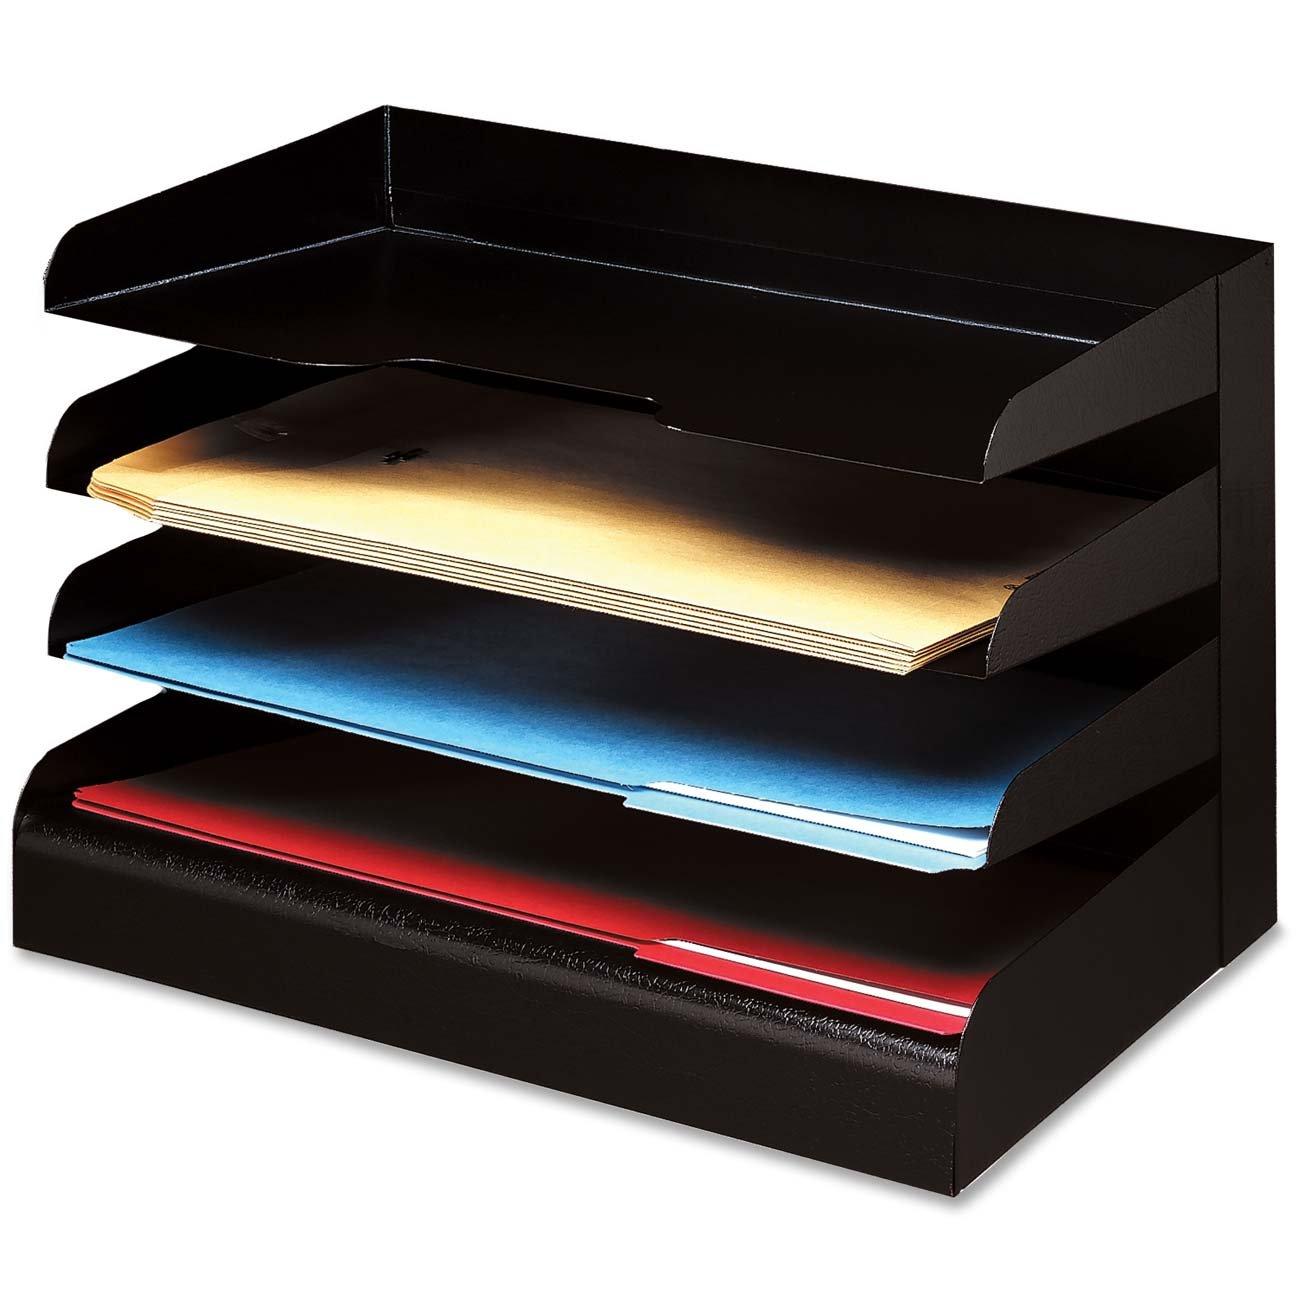 Buddy Products 0414-4 Classic 4 Tier Trays, Legal Size, Steel, 9.5 x 9.675 x 15-Inch, Black